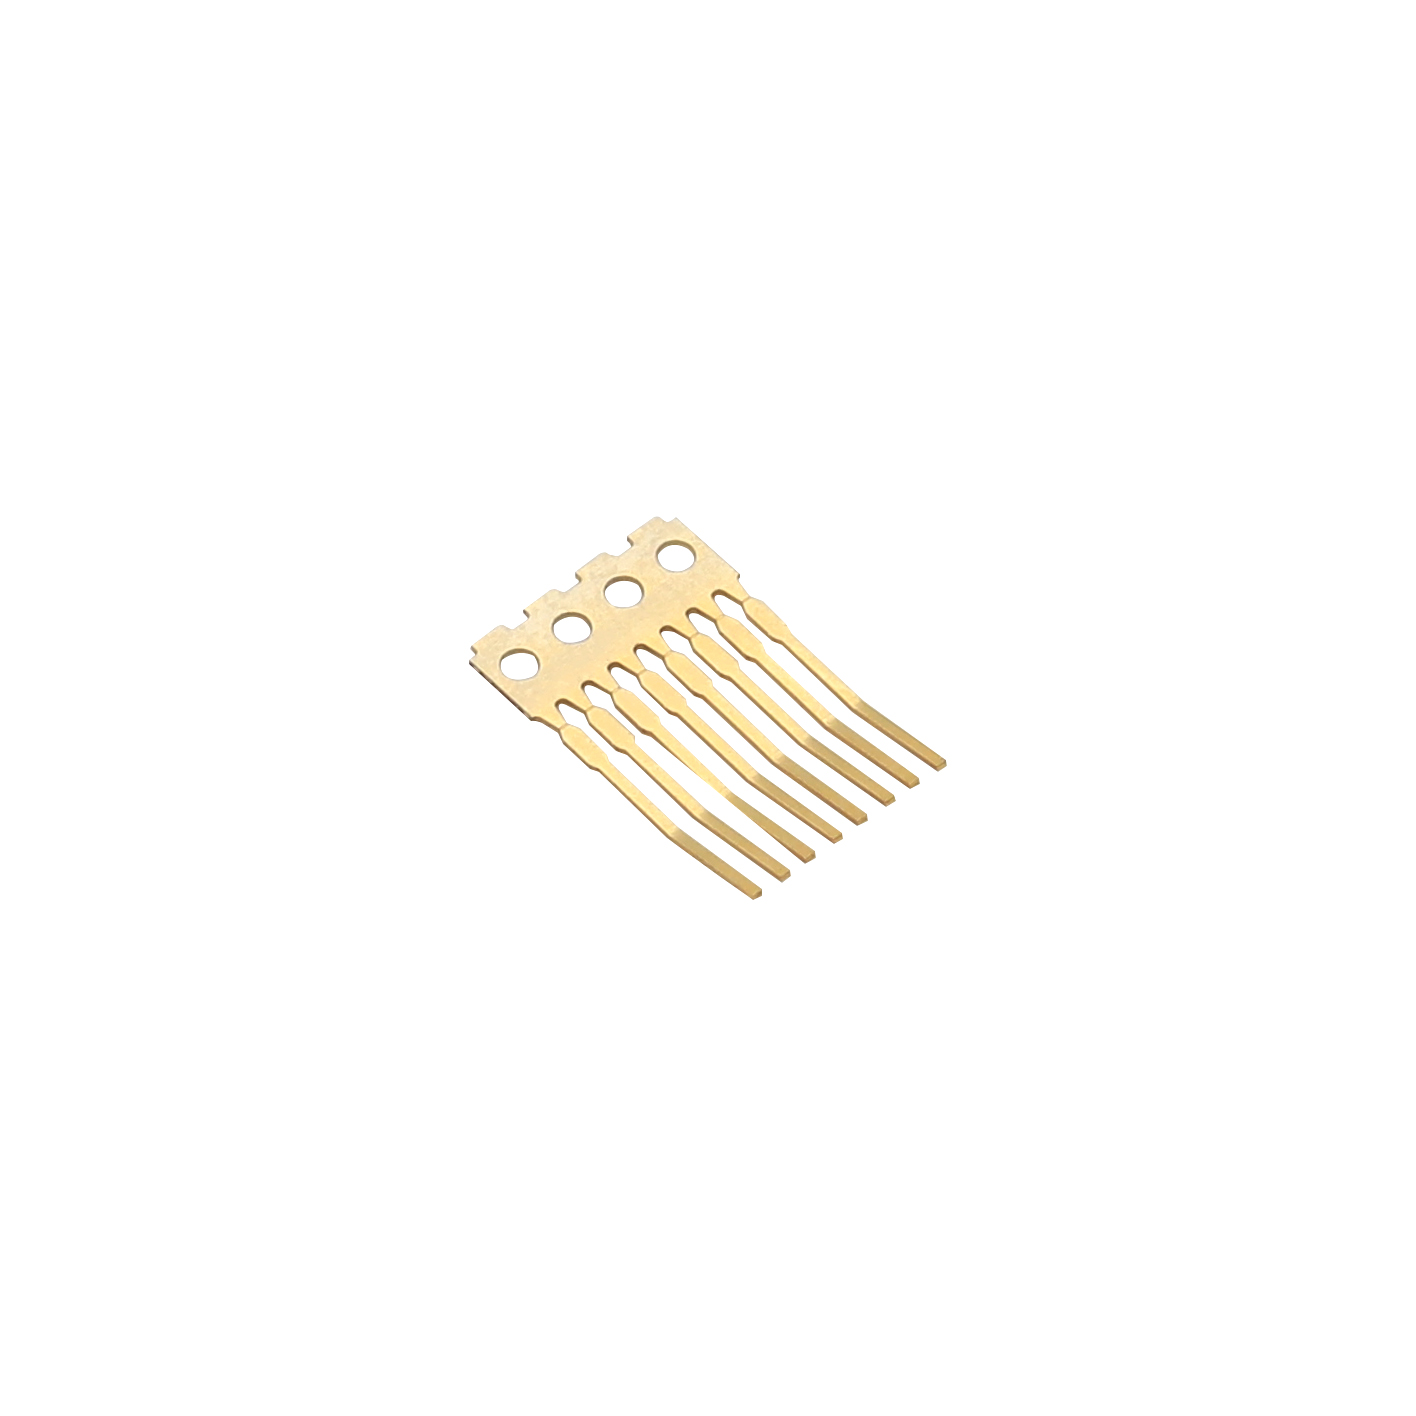 0.4x8.6鈹銅PIN針 接線端子插PIN插針端子非標定制端子志盈端子